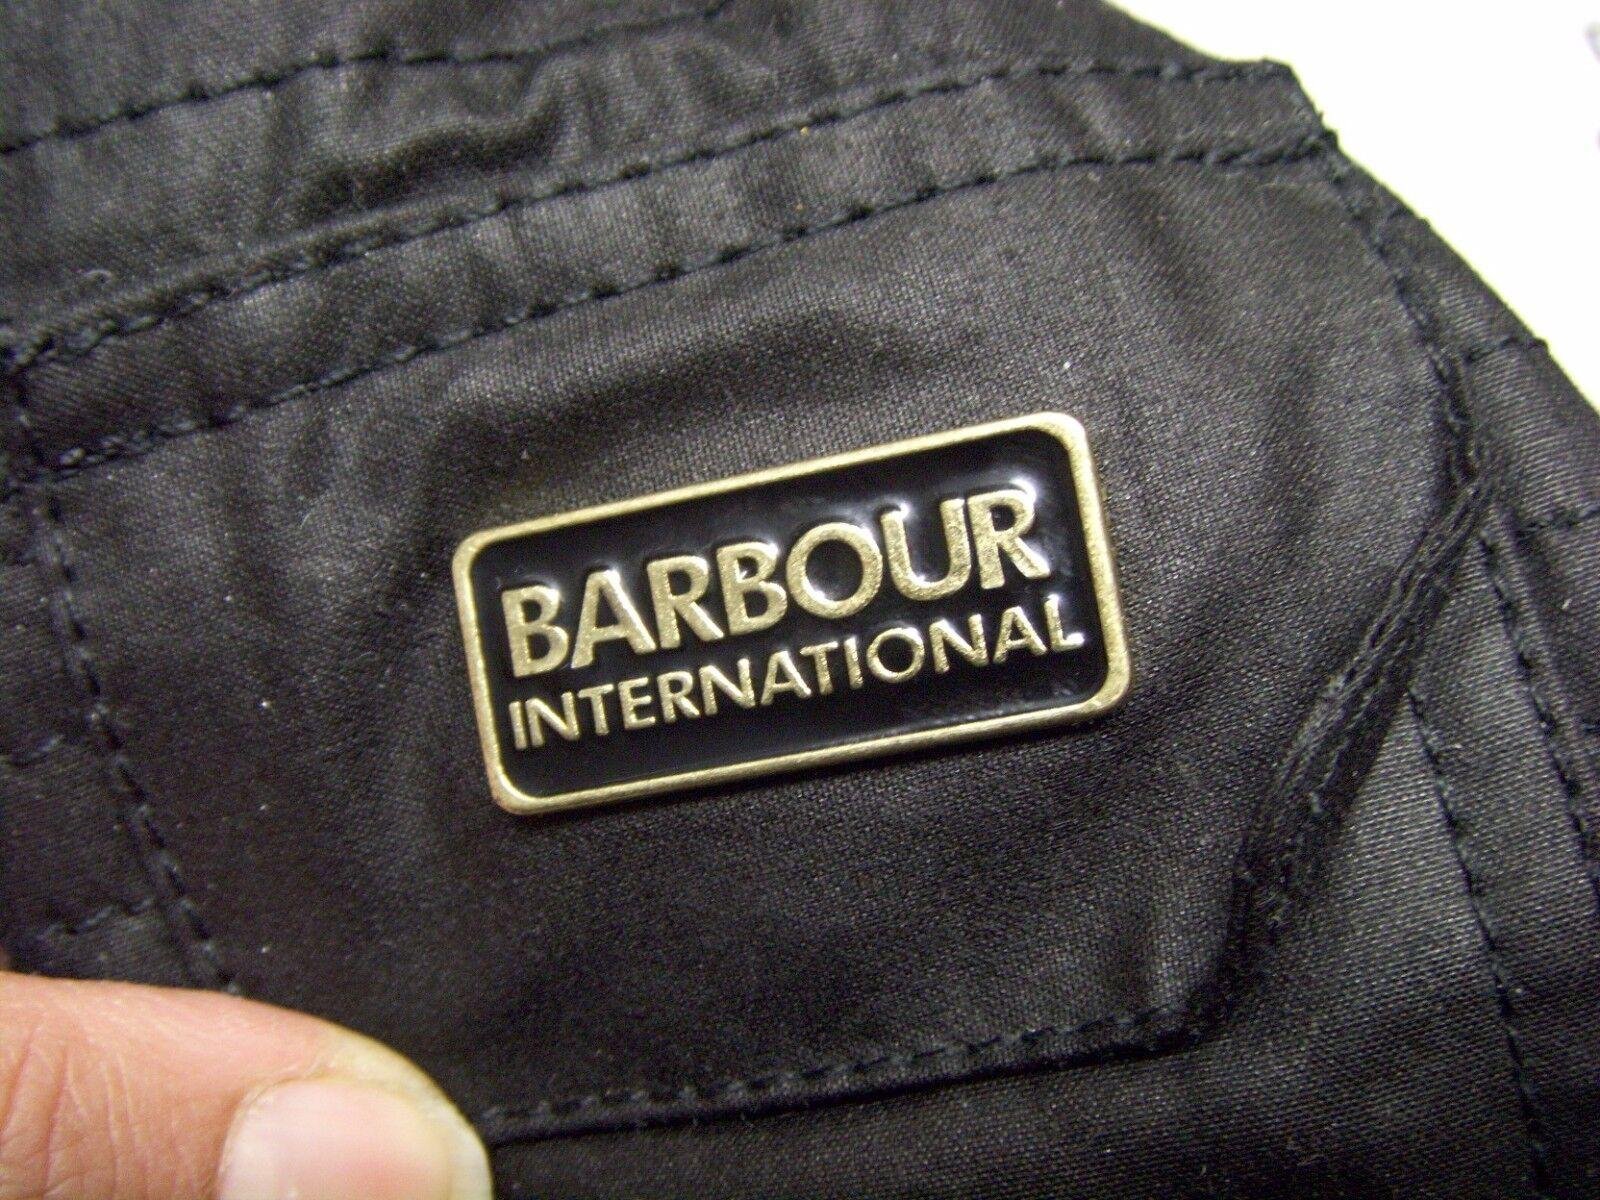 BARBOUR INTERNATIONAL VANIER WAX JACKET Size 4 US - image 9